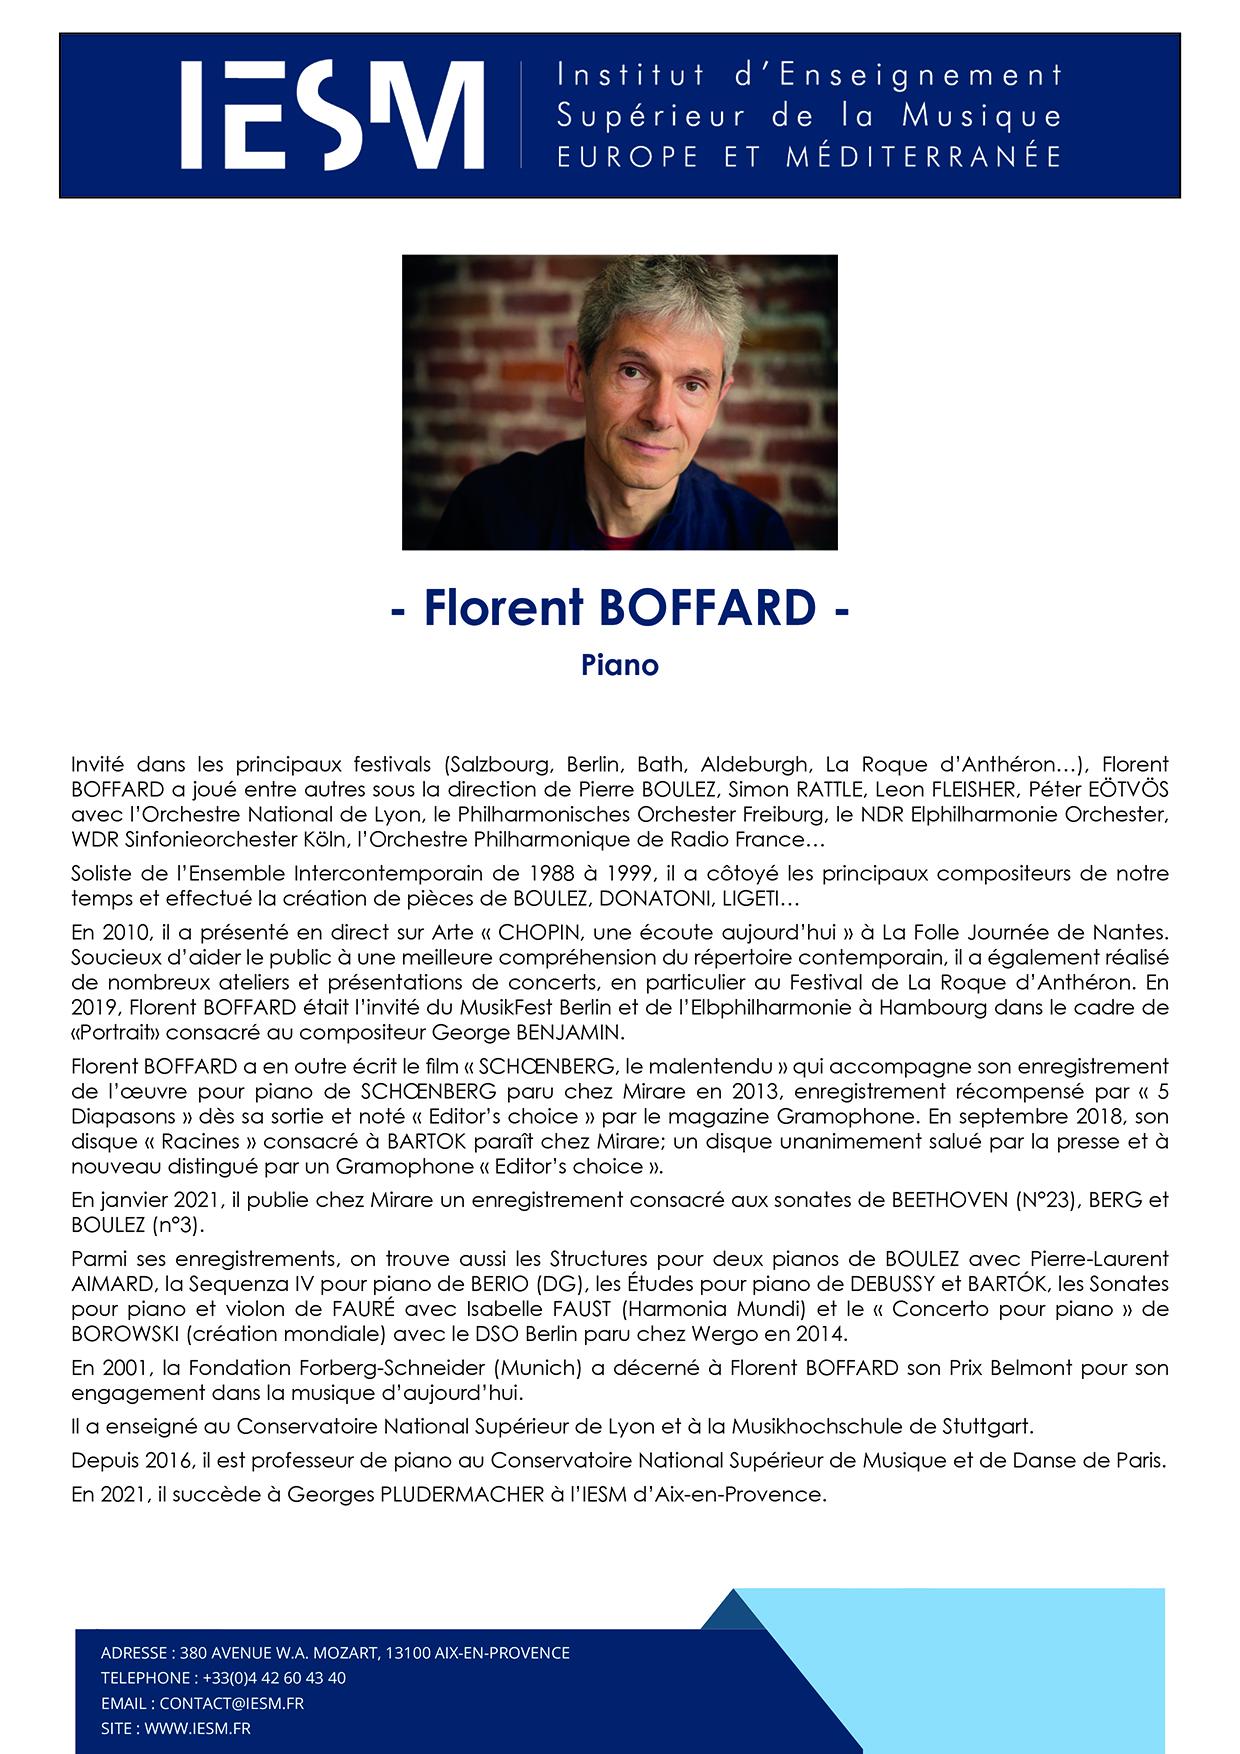 BOFFARD Florent